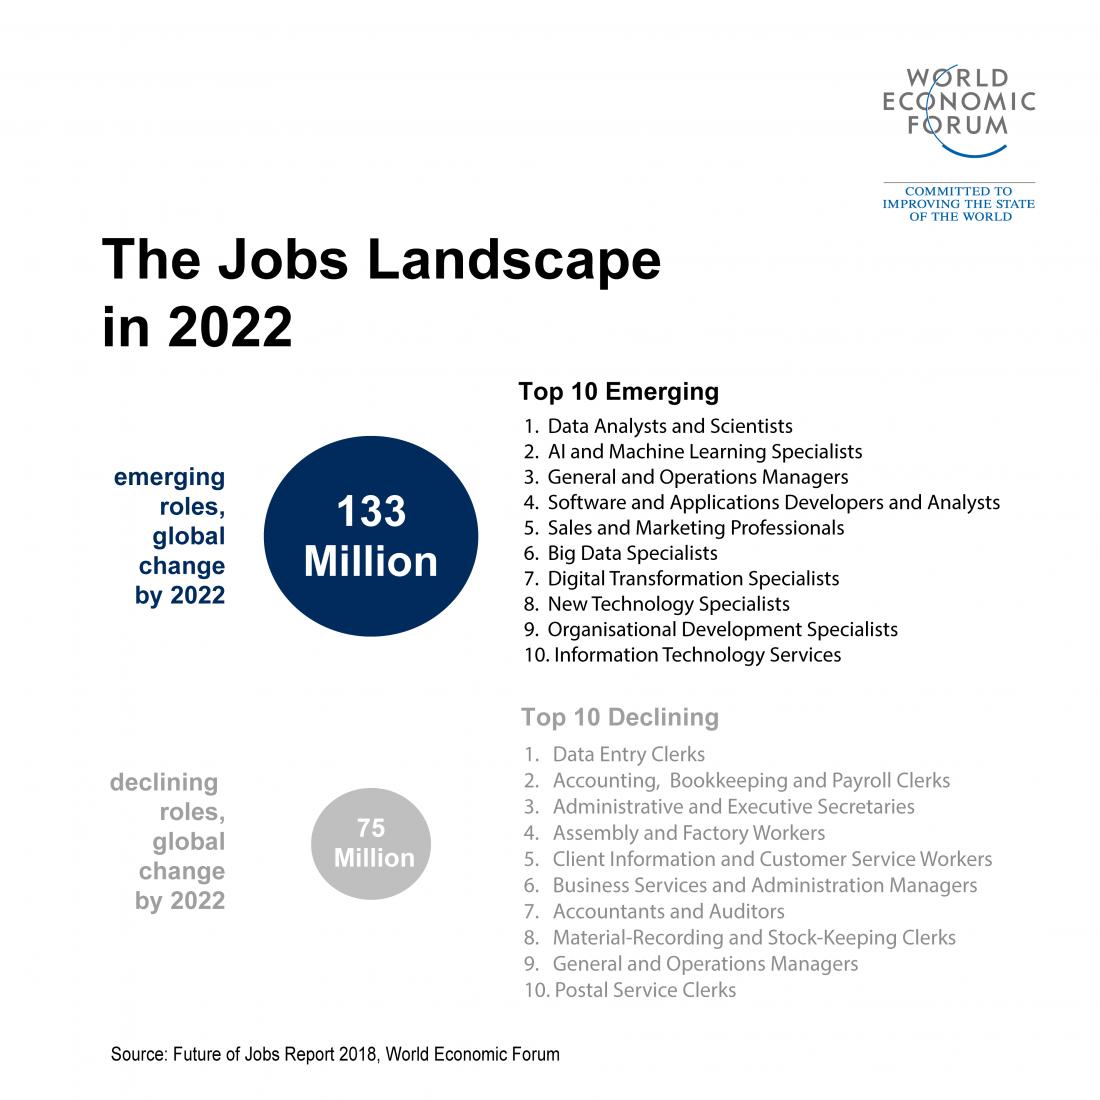 FIGURE 6:    THE JOBS LANDSCAPE IN 2022 (SOURCE: FUTURE OF JOBS REPORT 2022, WORLD ECONOMIC FORUM)